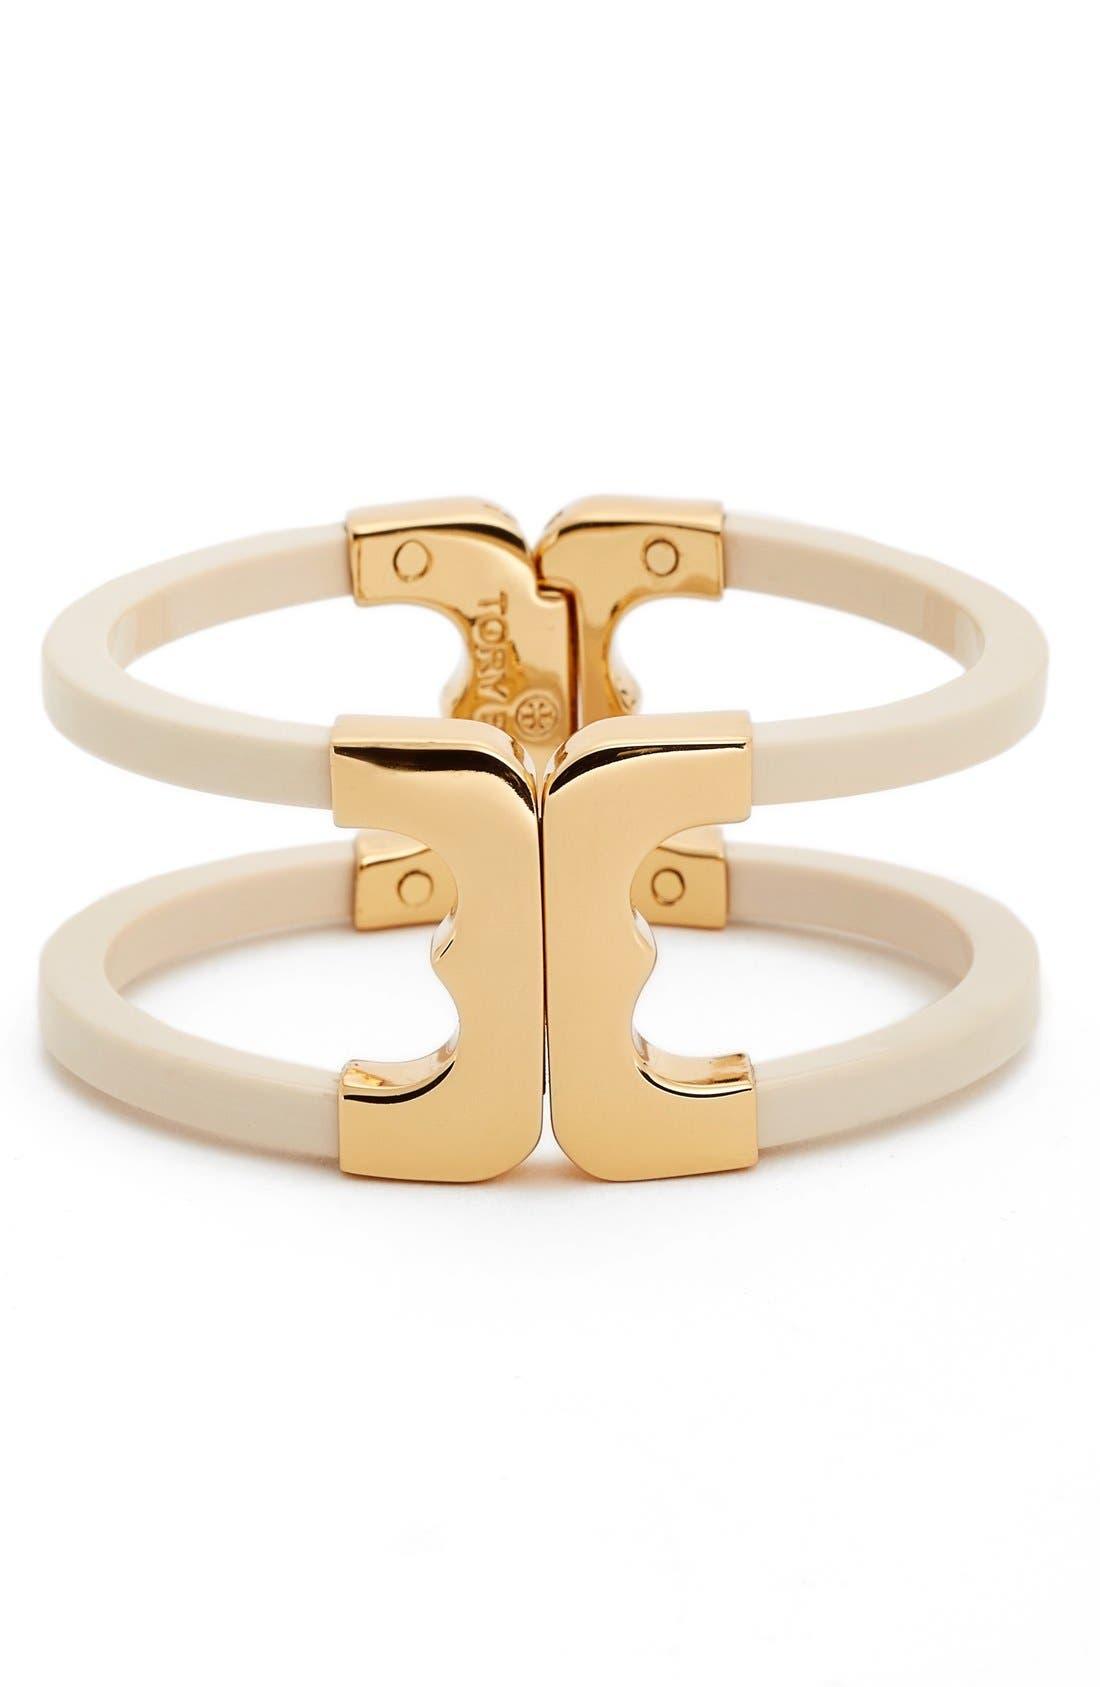 'Gemini' Openwork Bracelet,                             Main thumbnail 1, color,                             Ivory/ Gold